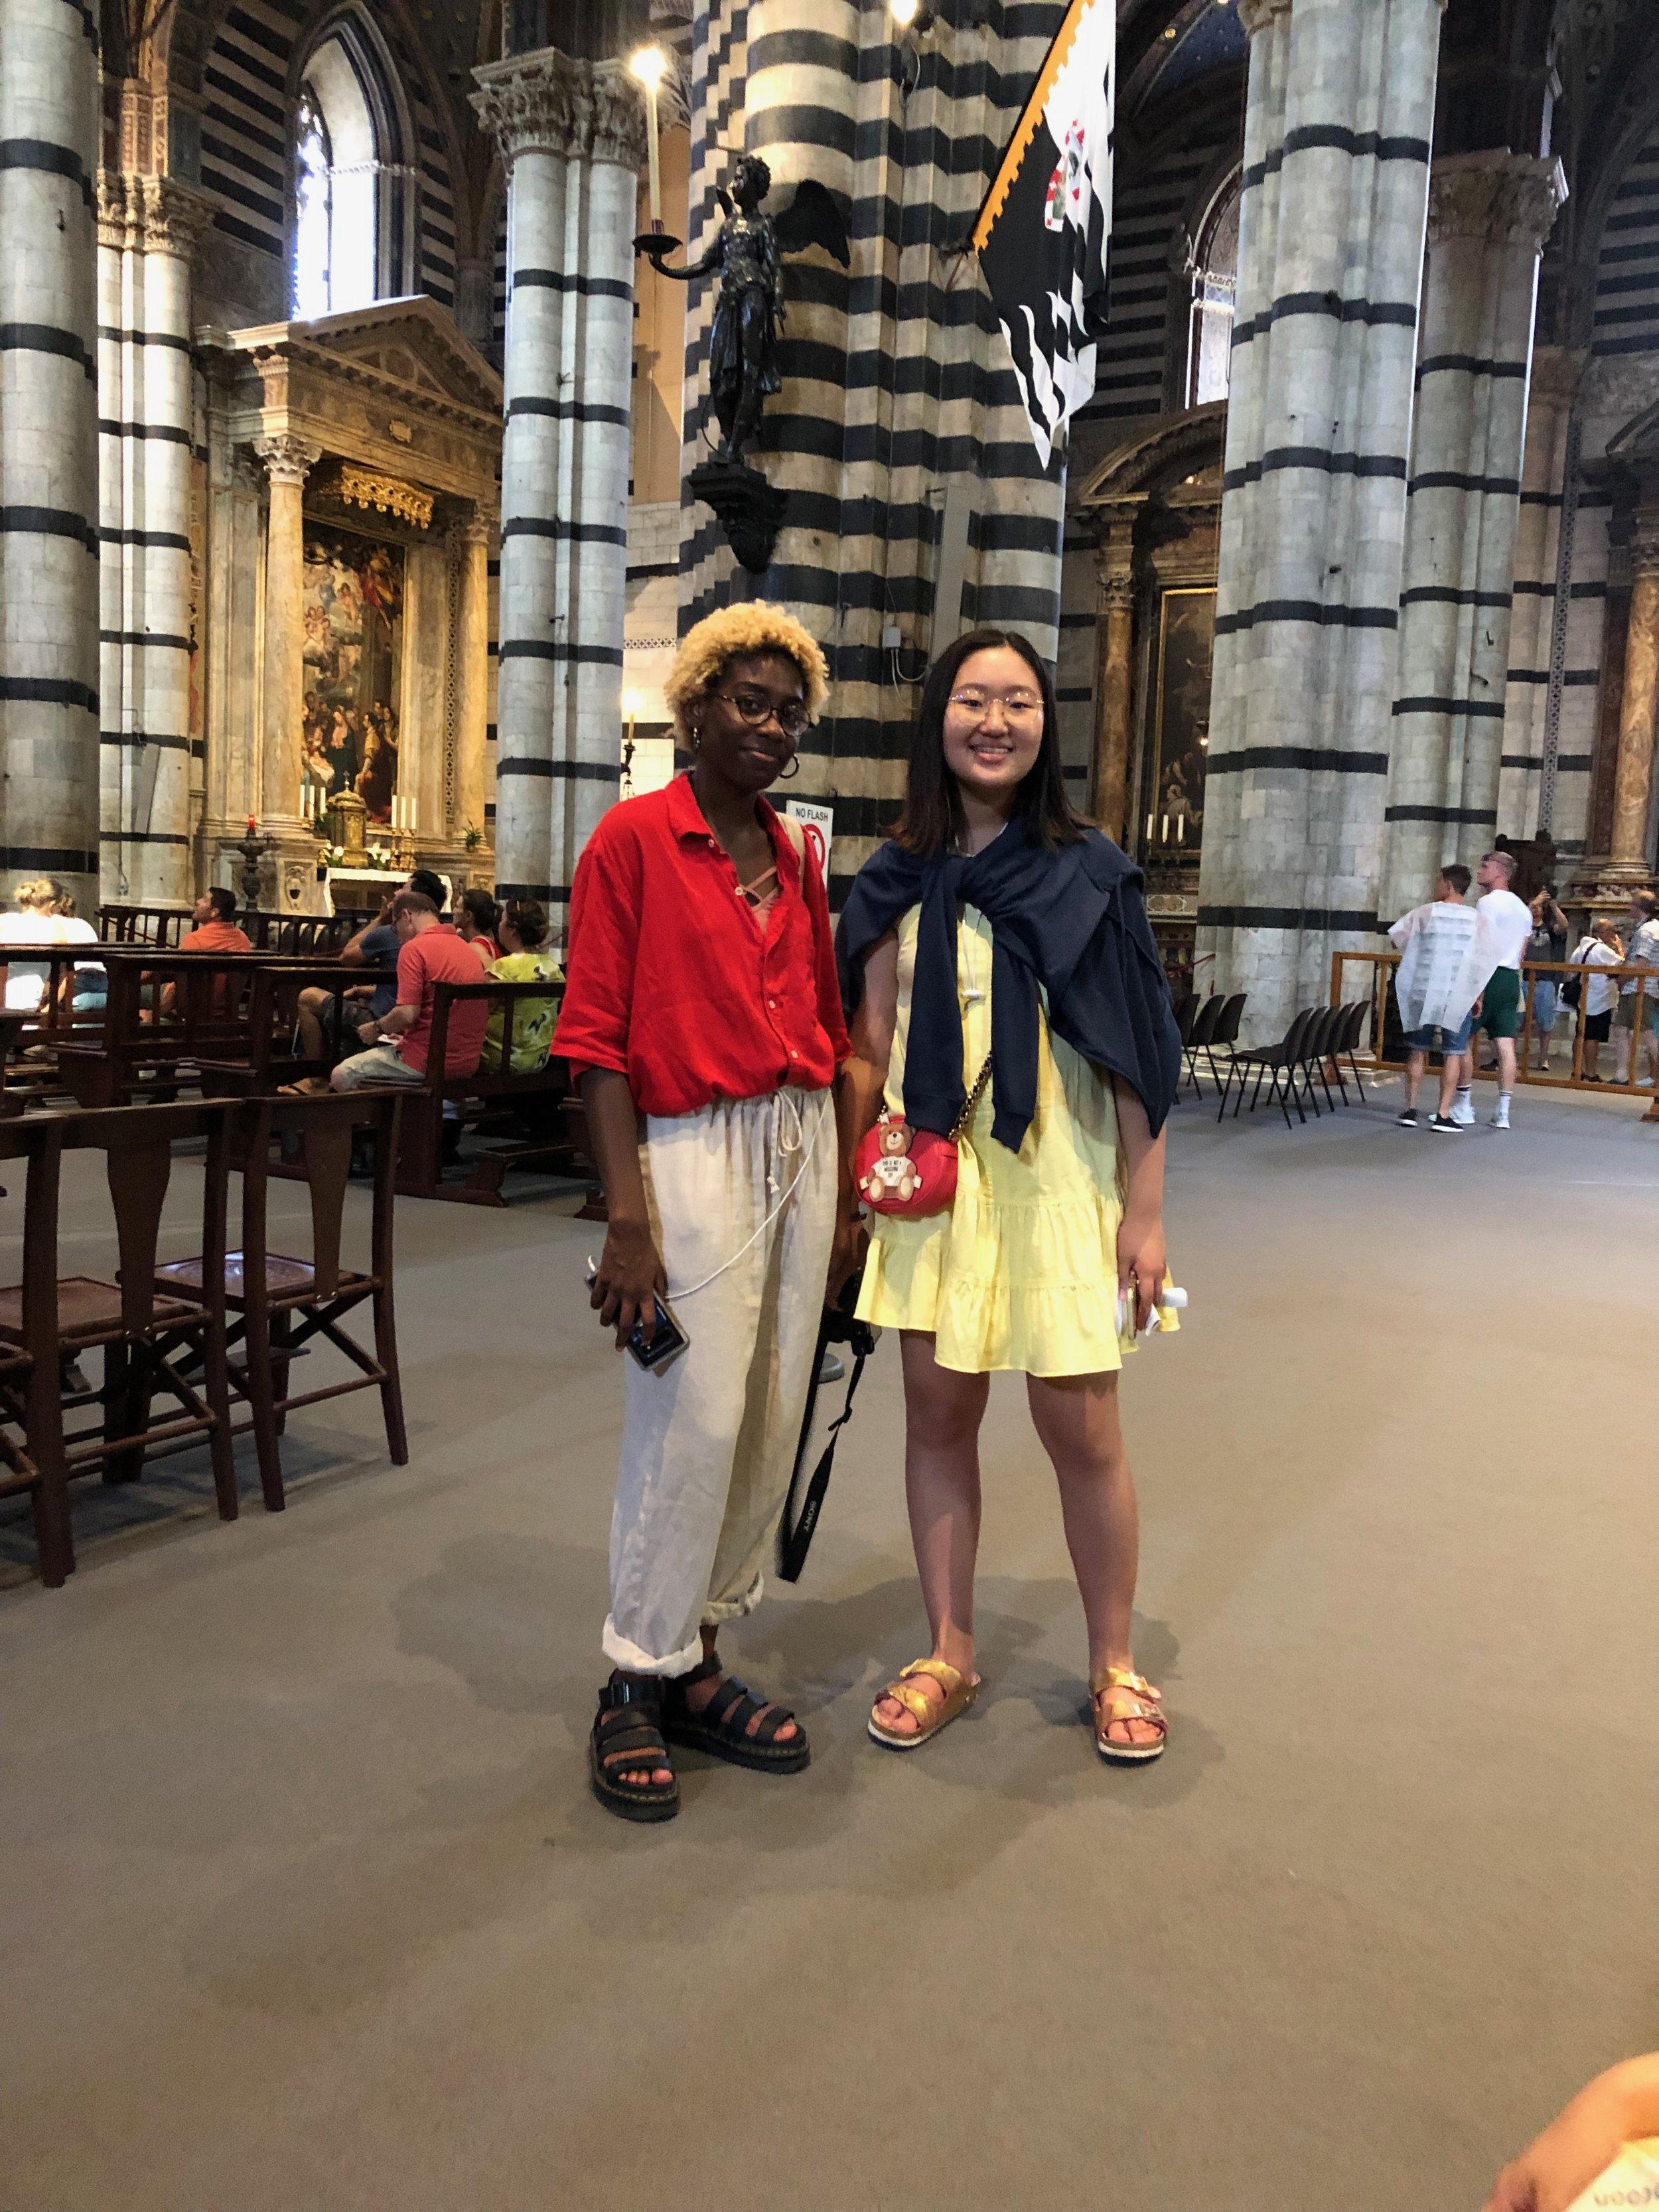 Sonnet and Erin in Chiusi.jpg